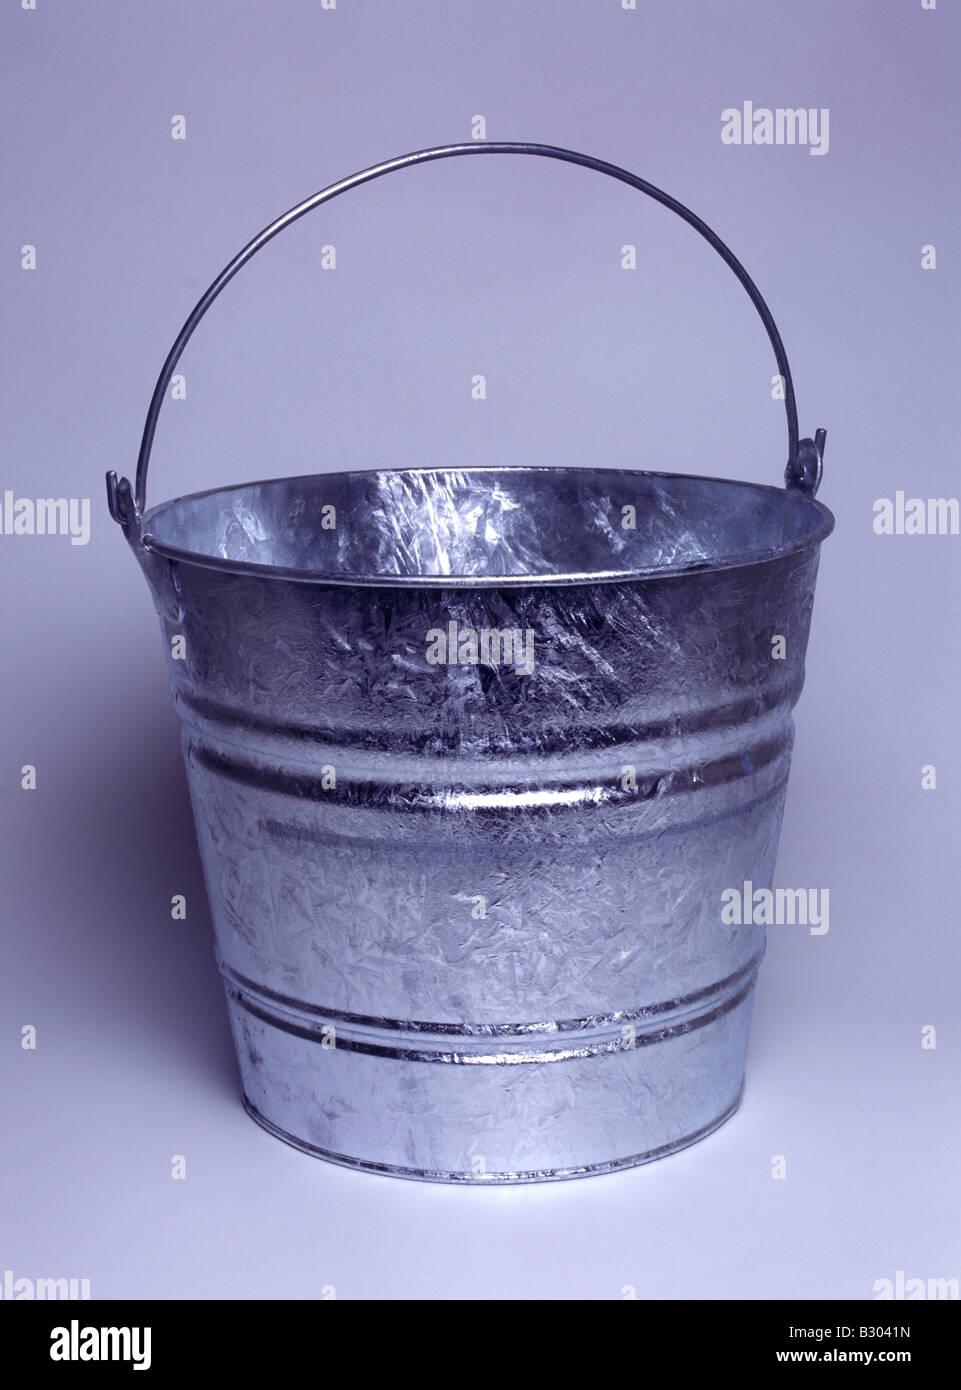 Benna zincato Immagini Stock